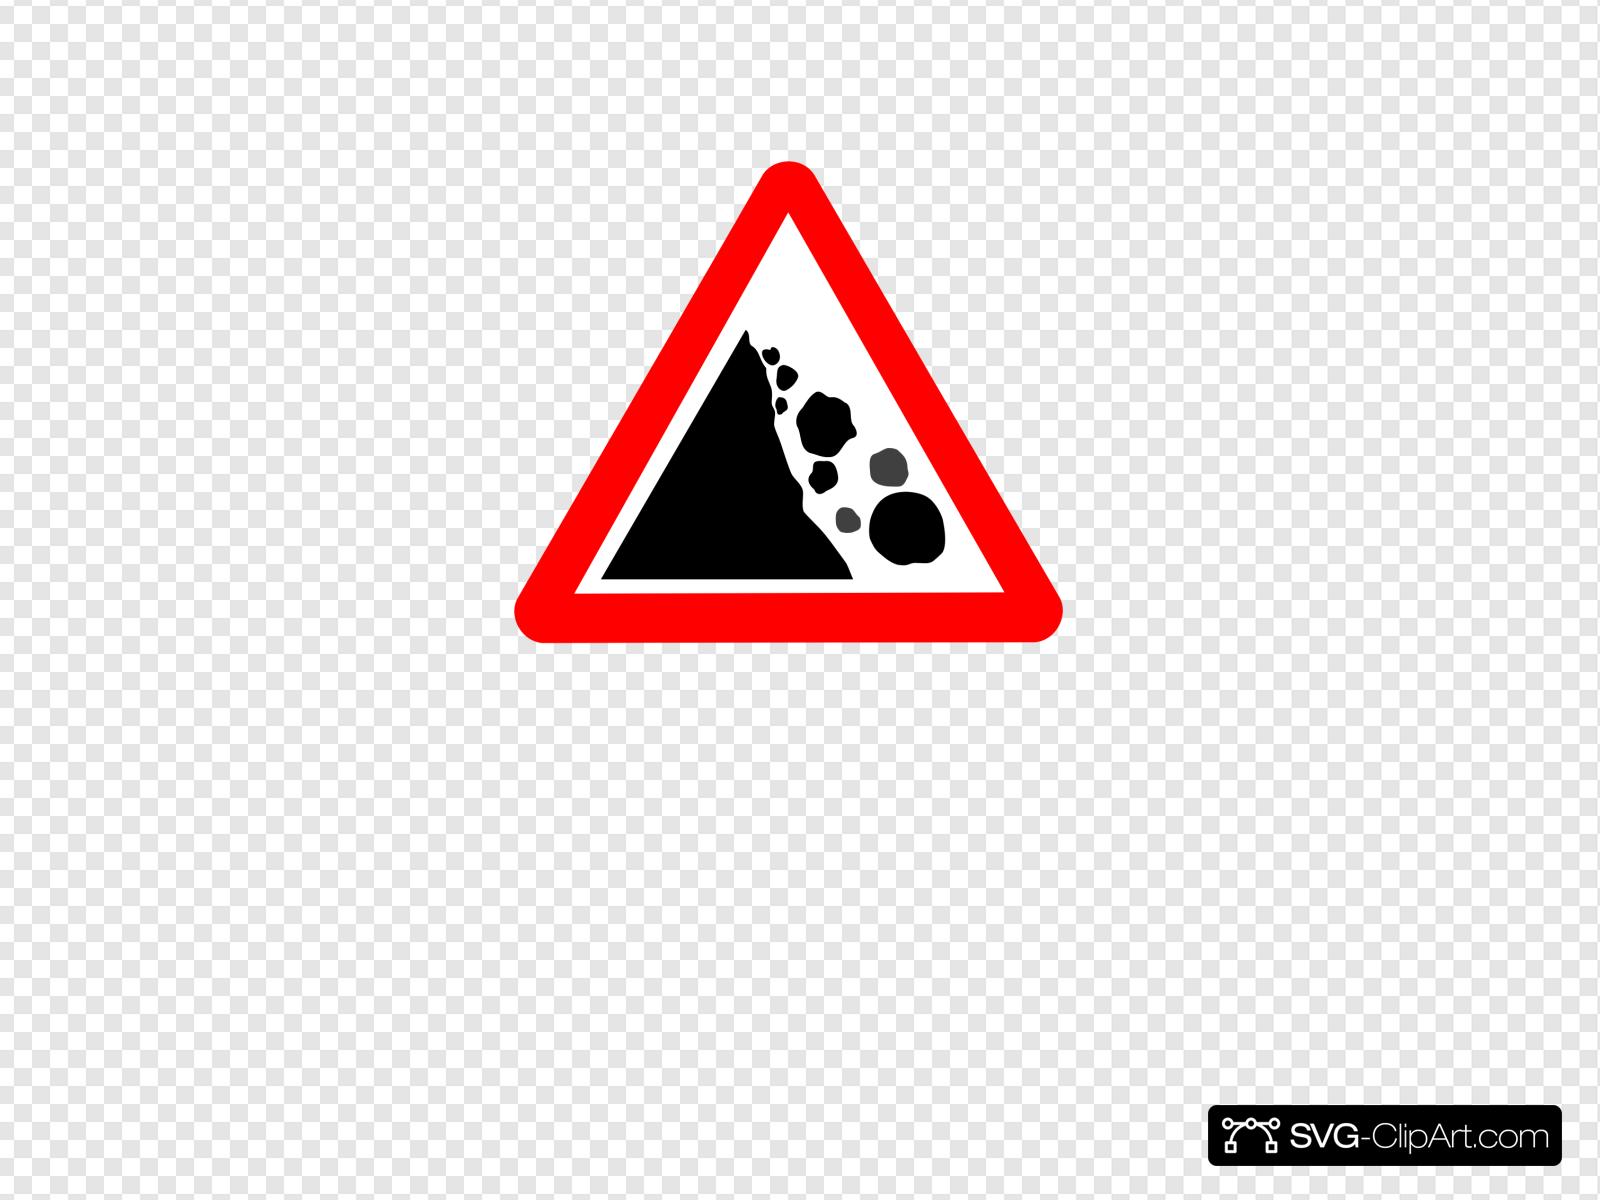 Falling rocks clipart image royalty free download Falling Rocks Clip art, Icon and SVG - SVG Clipart image royalty free download